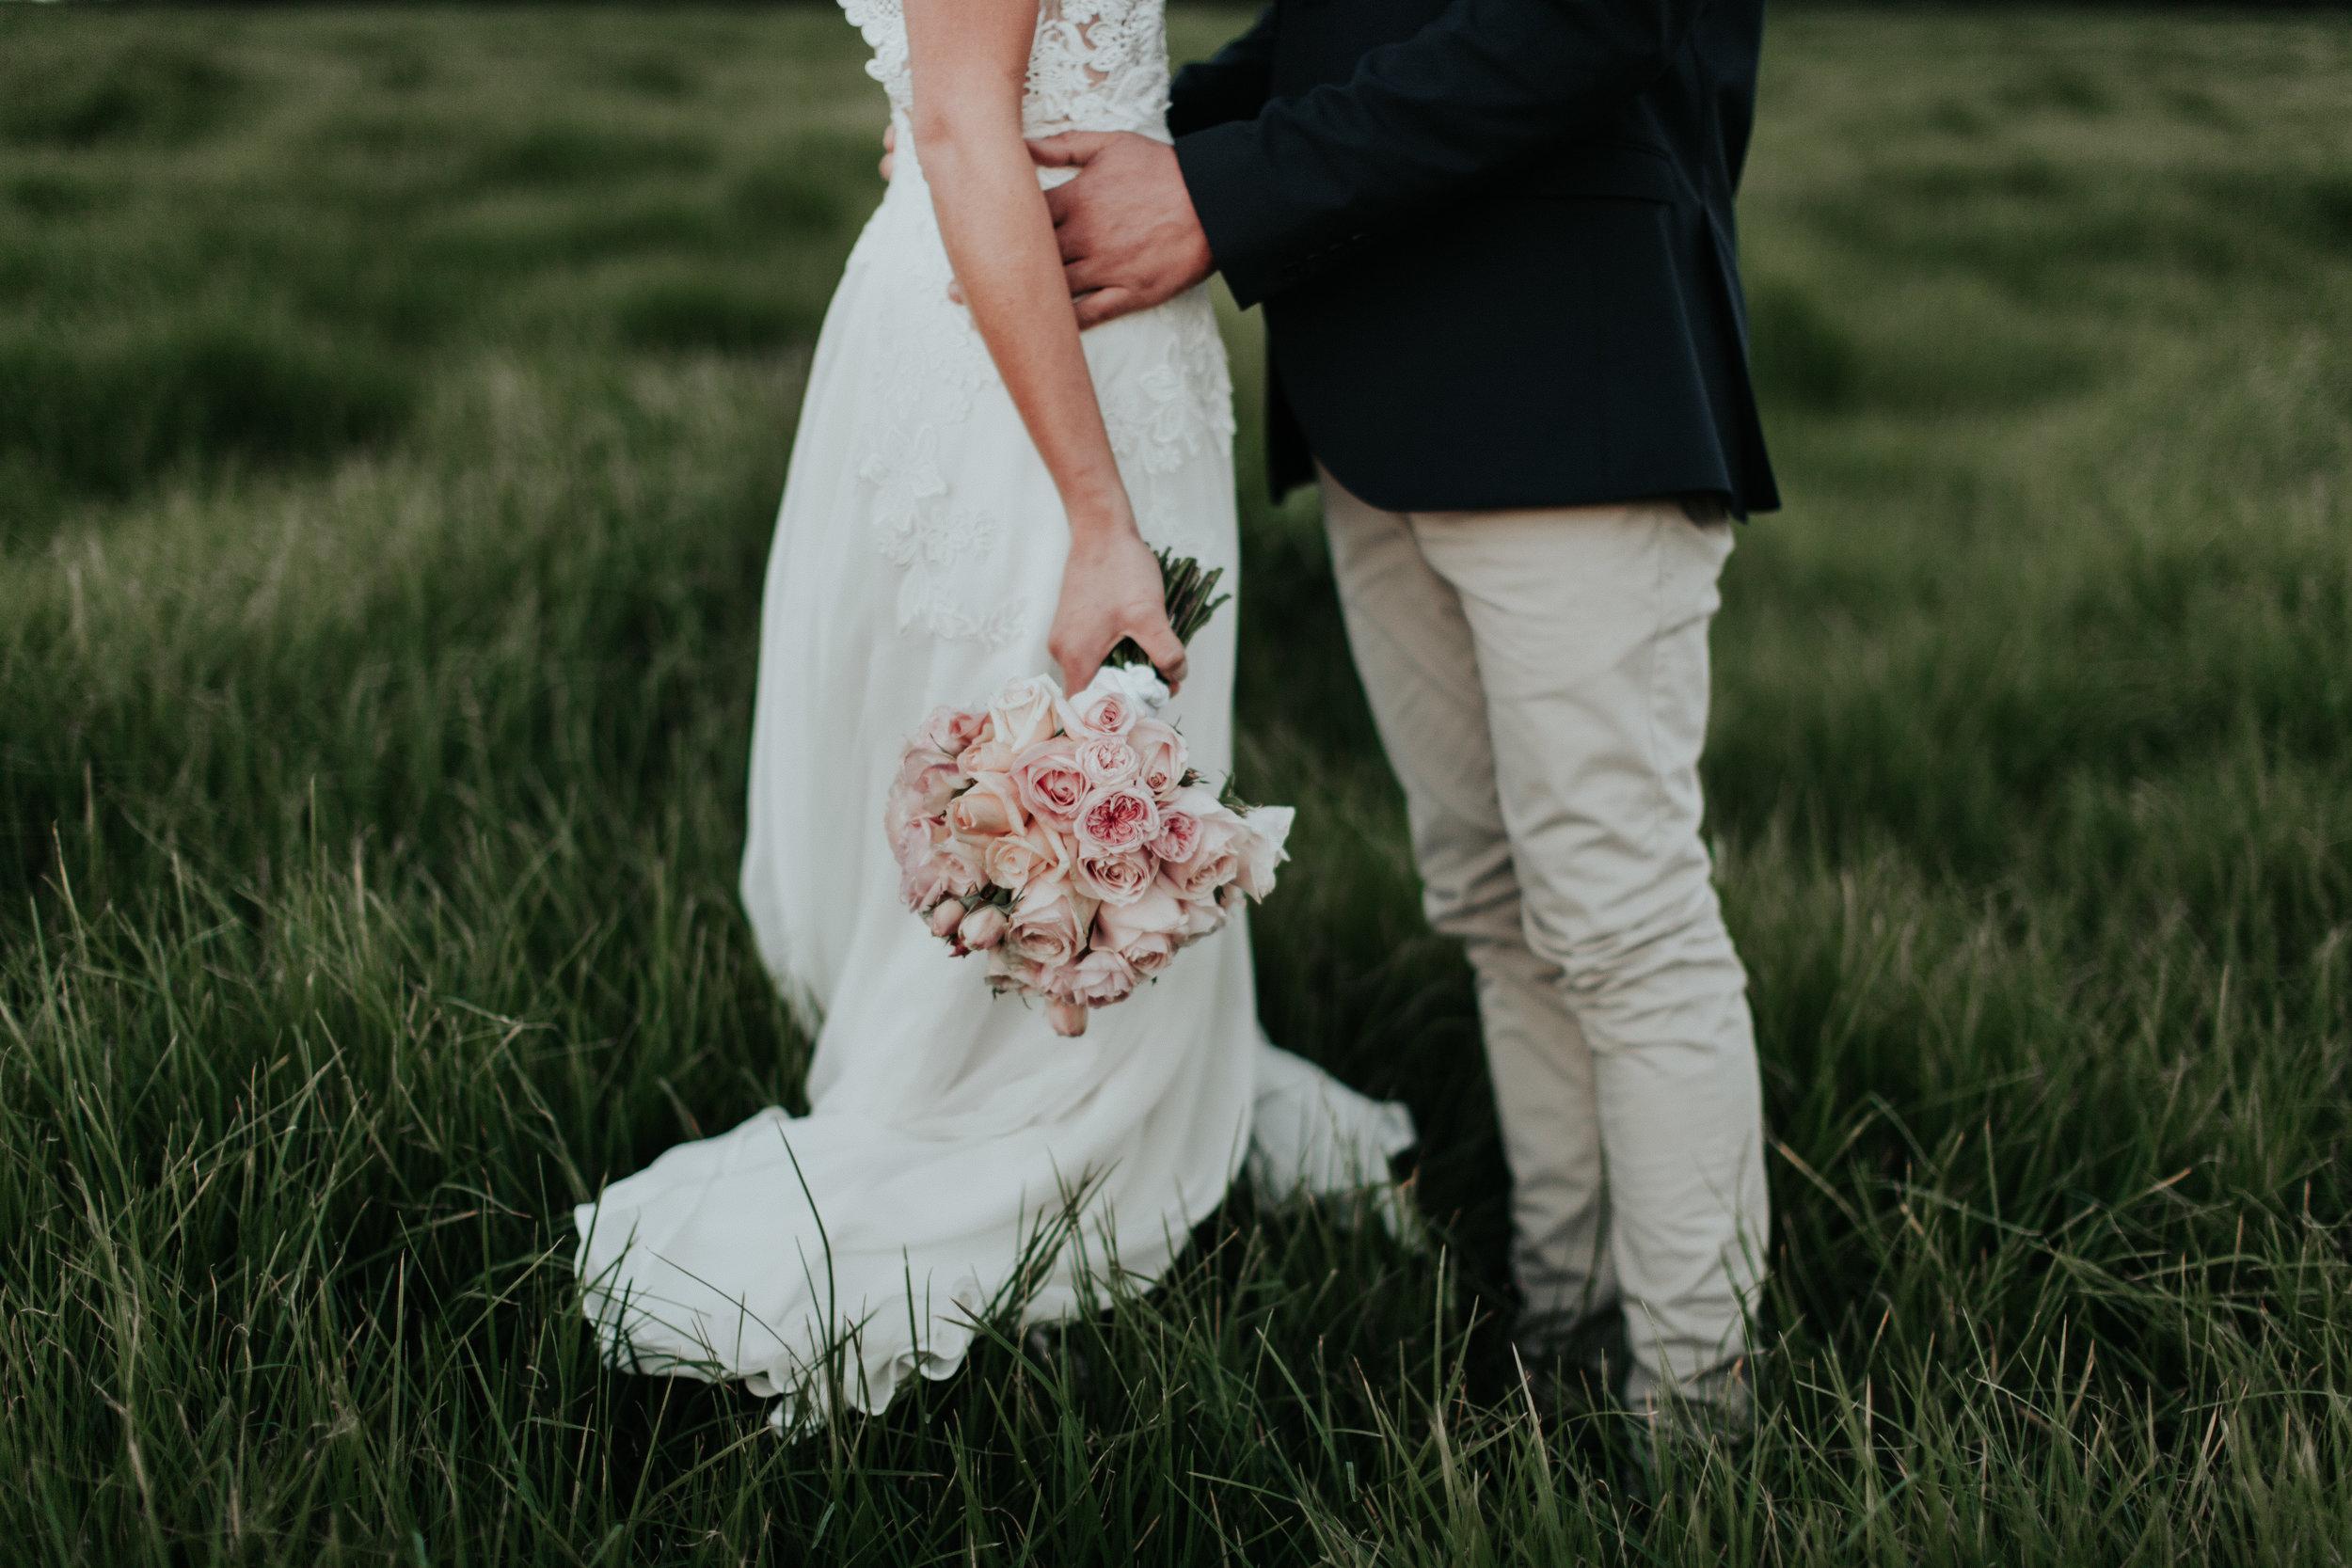 Kristi Smith Photography - Wedding Photography 3.jpg